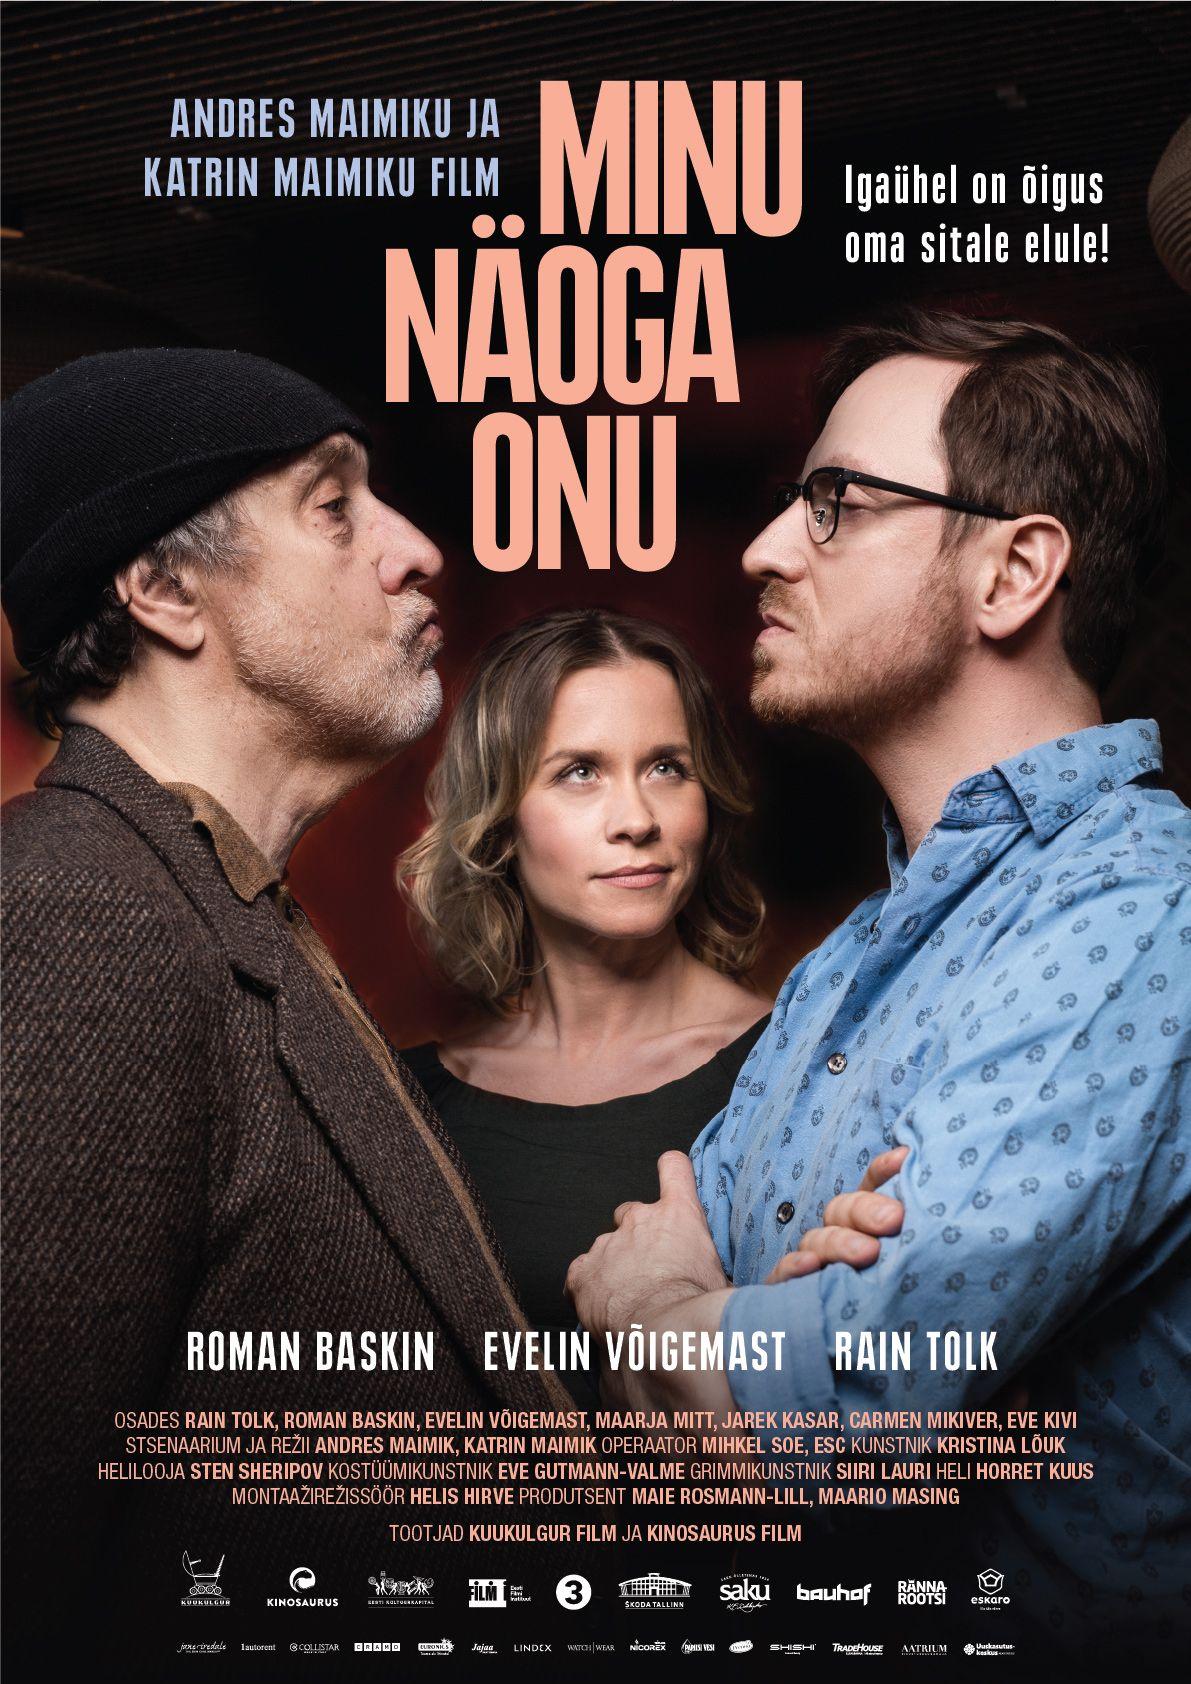 Minu Naoga Onu The Man Who Looks Like Me 私と同じ顔の おじさん 新作映画 映画 映画祭